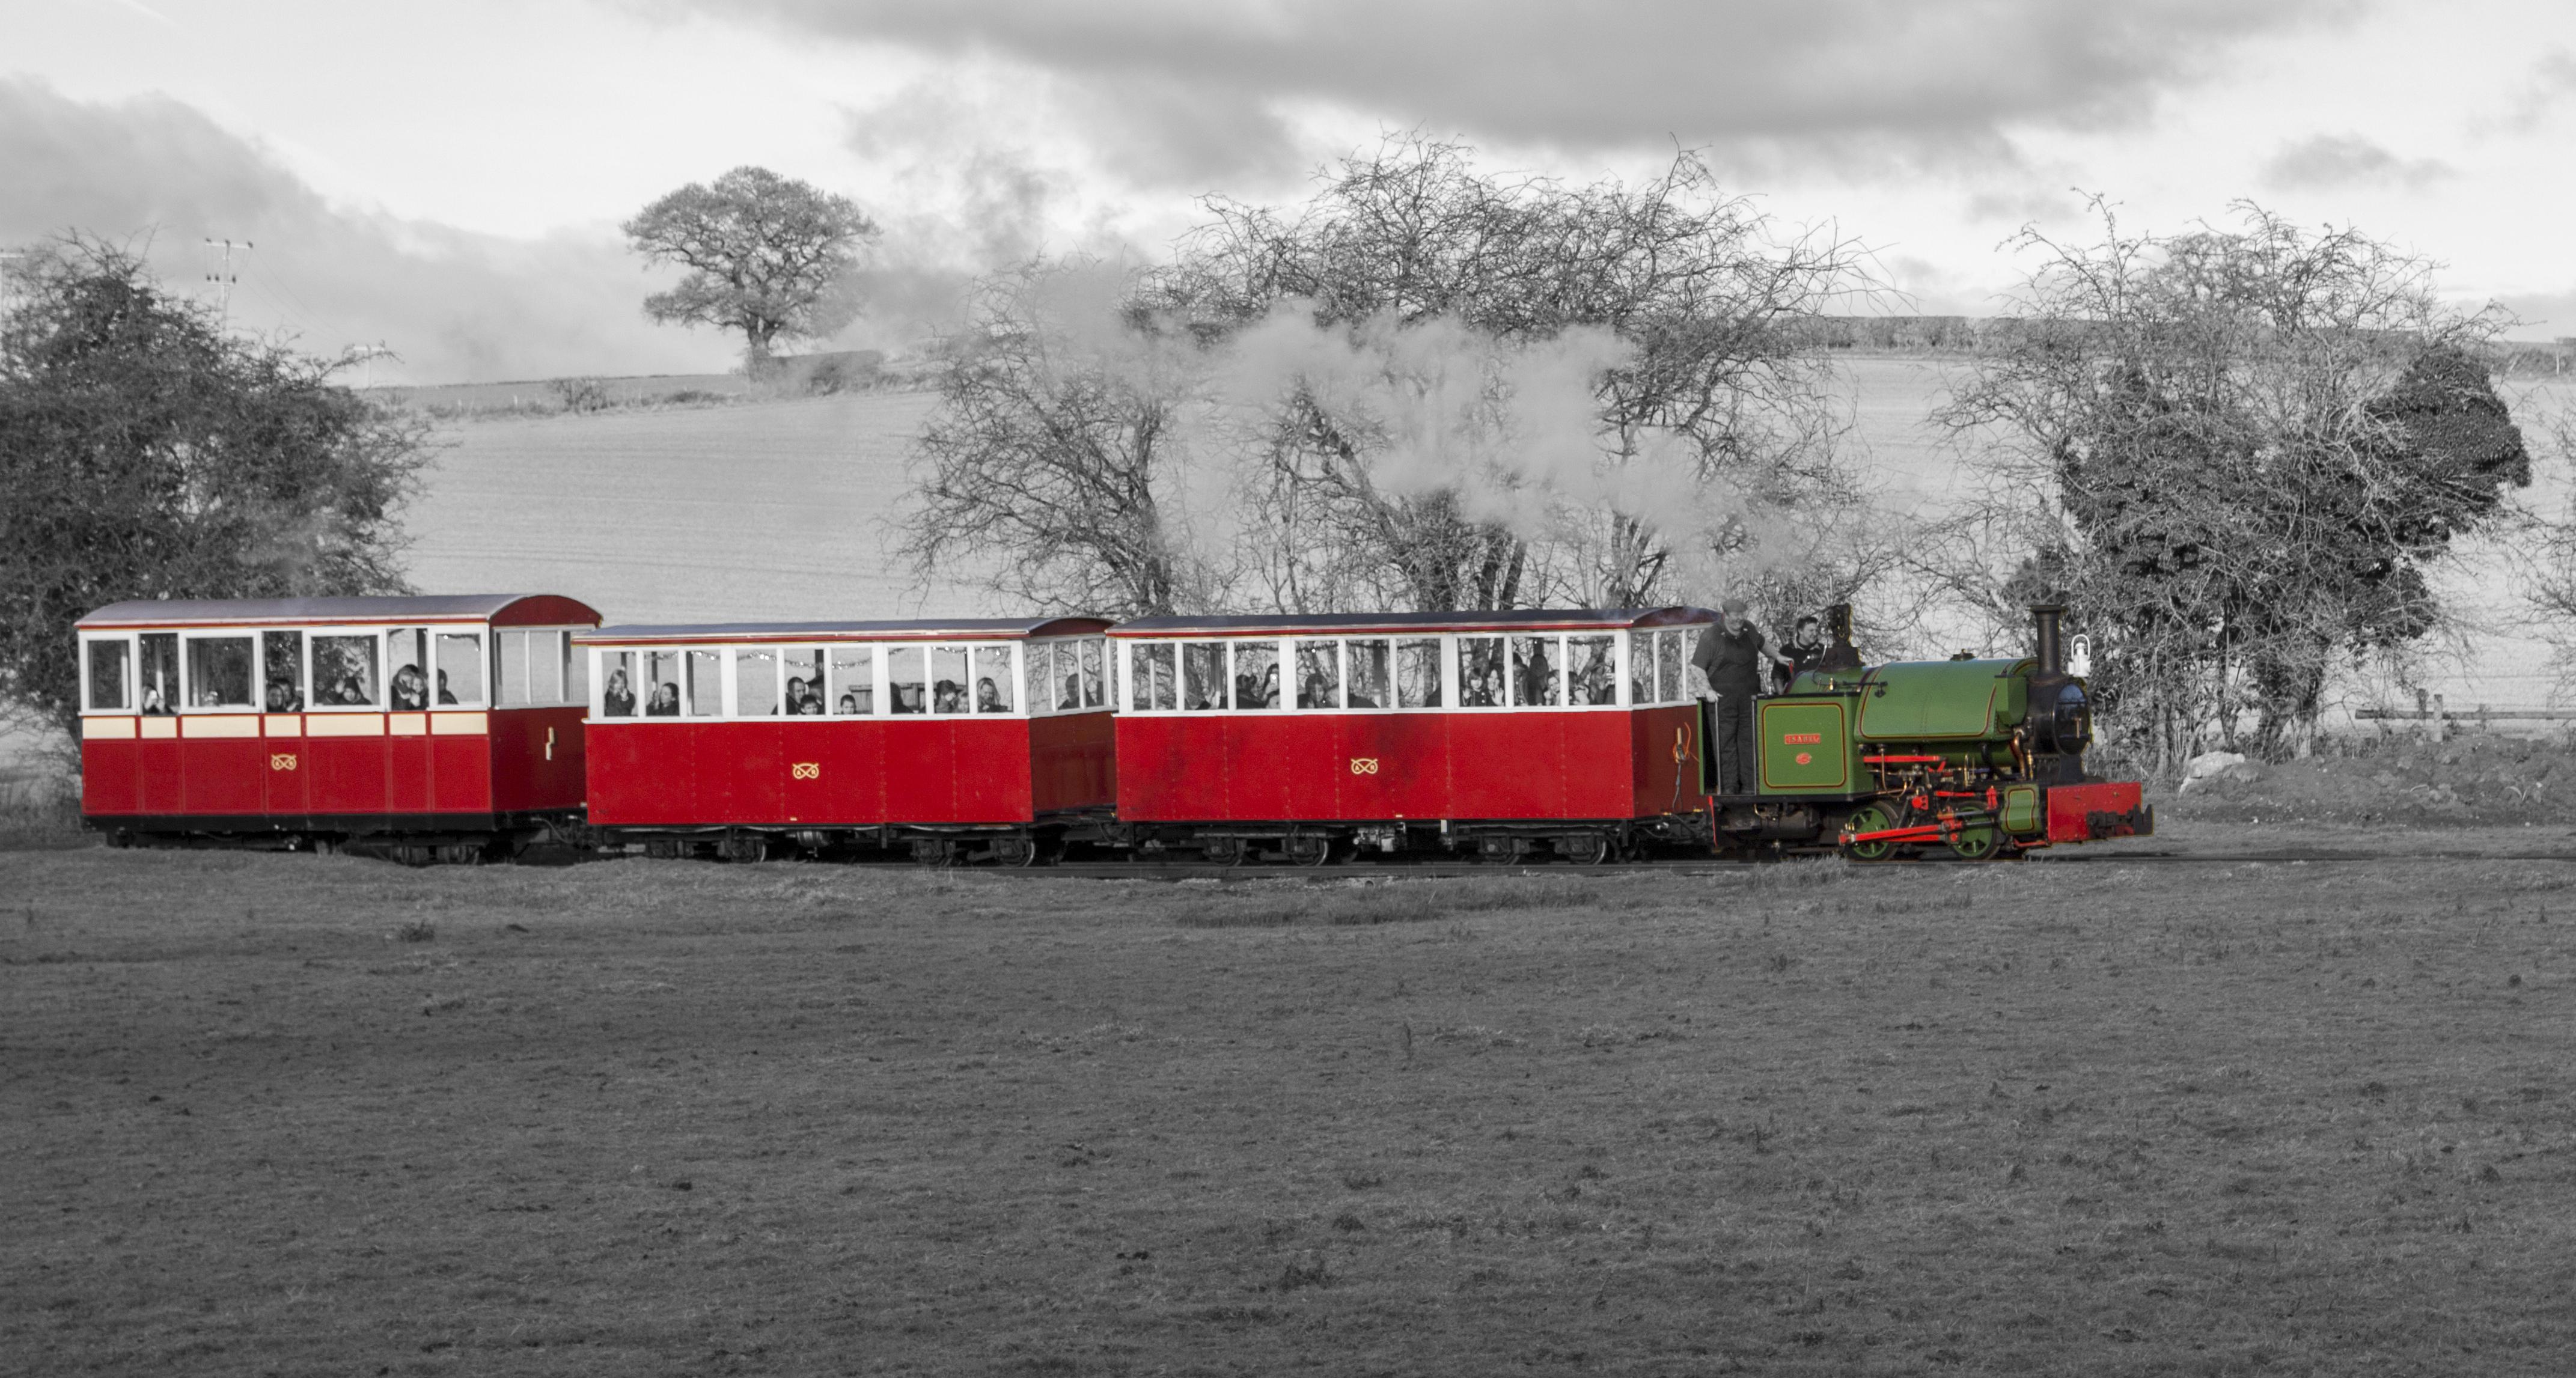 Amerton Railway - Heritage Steam Trains in Staffordshire